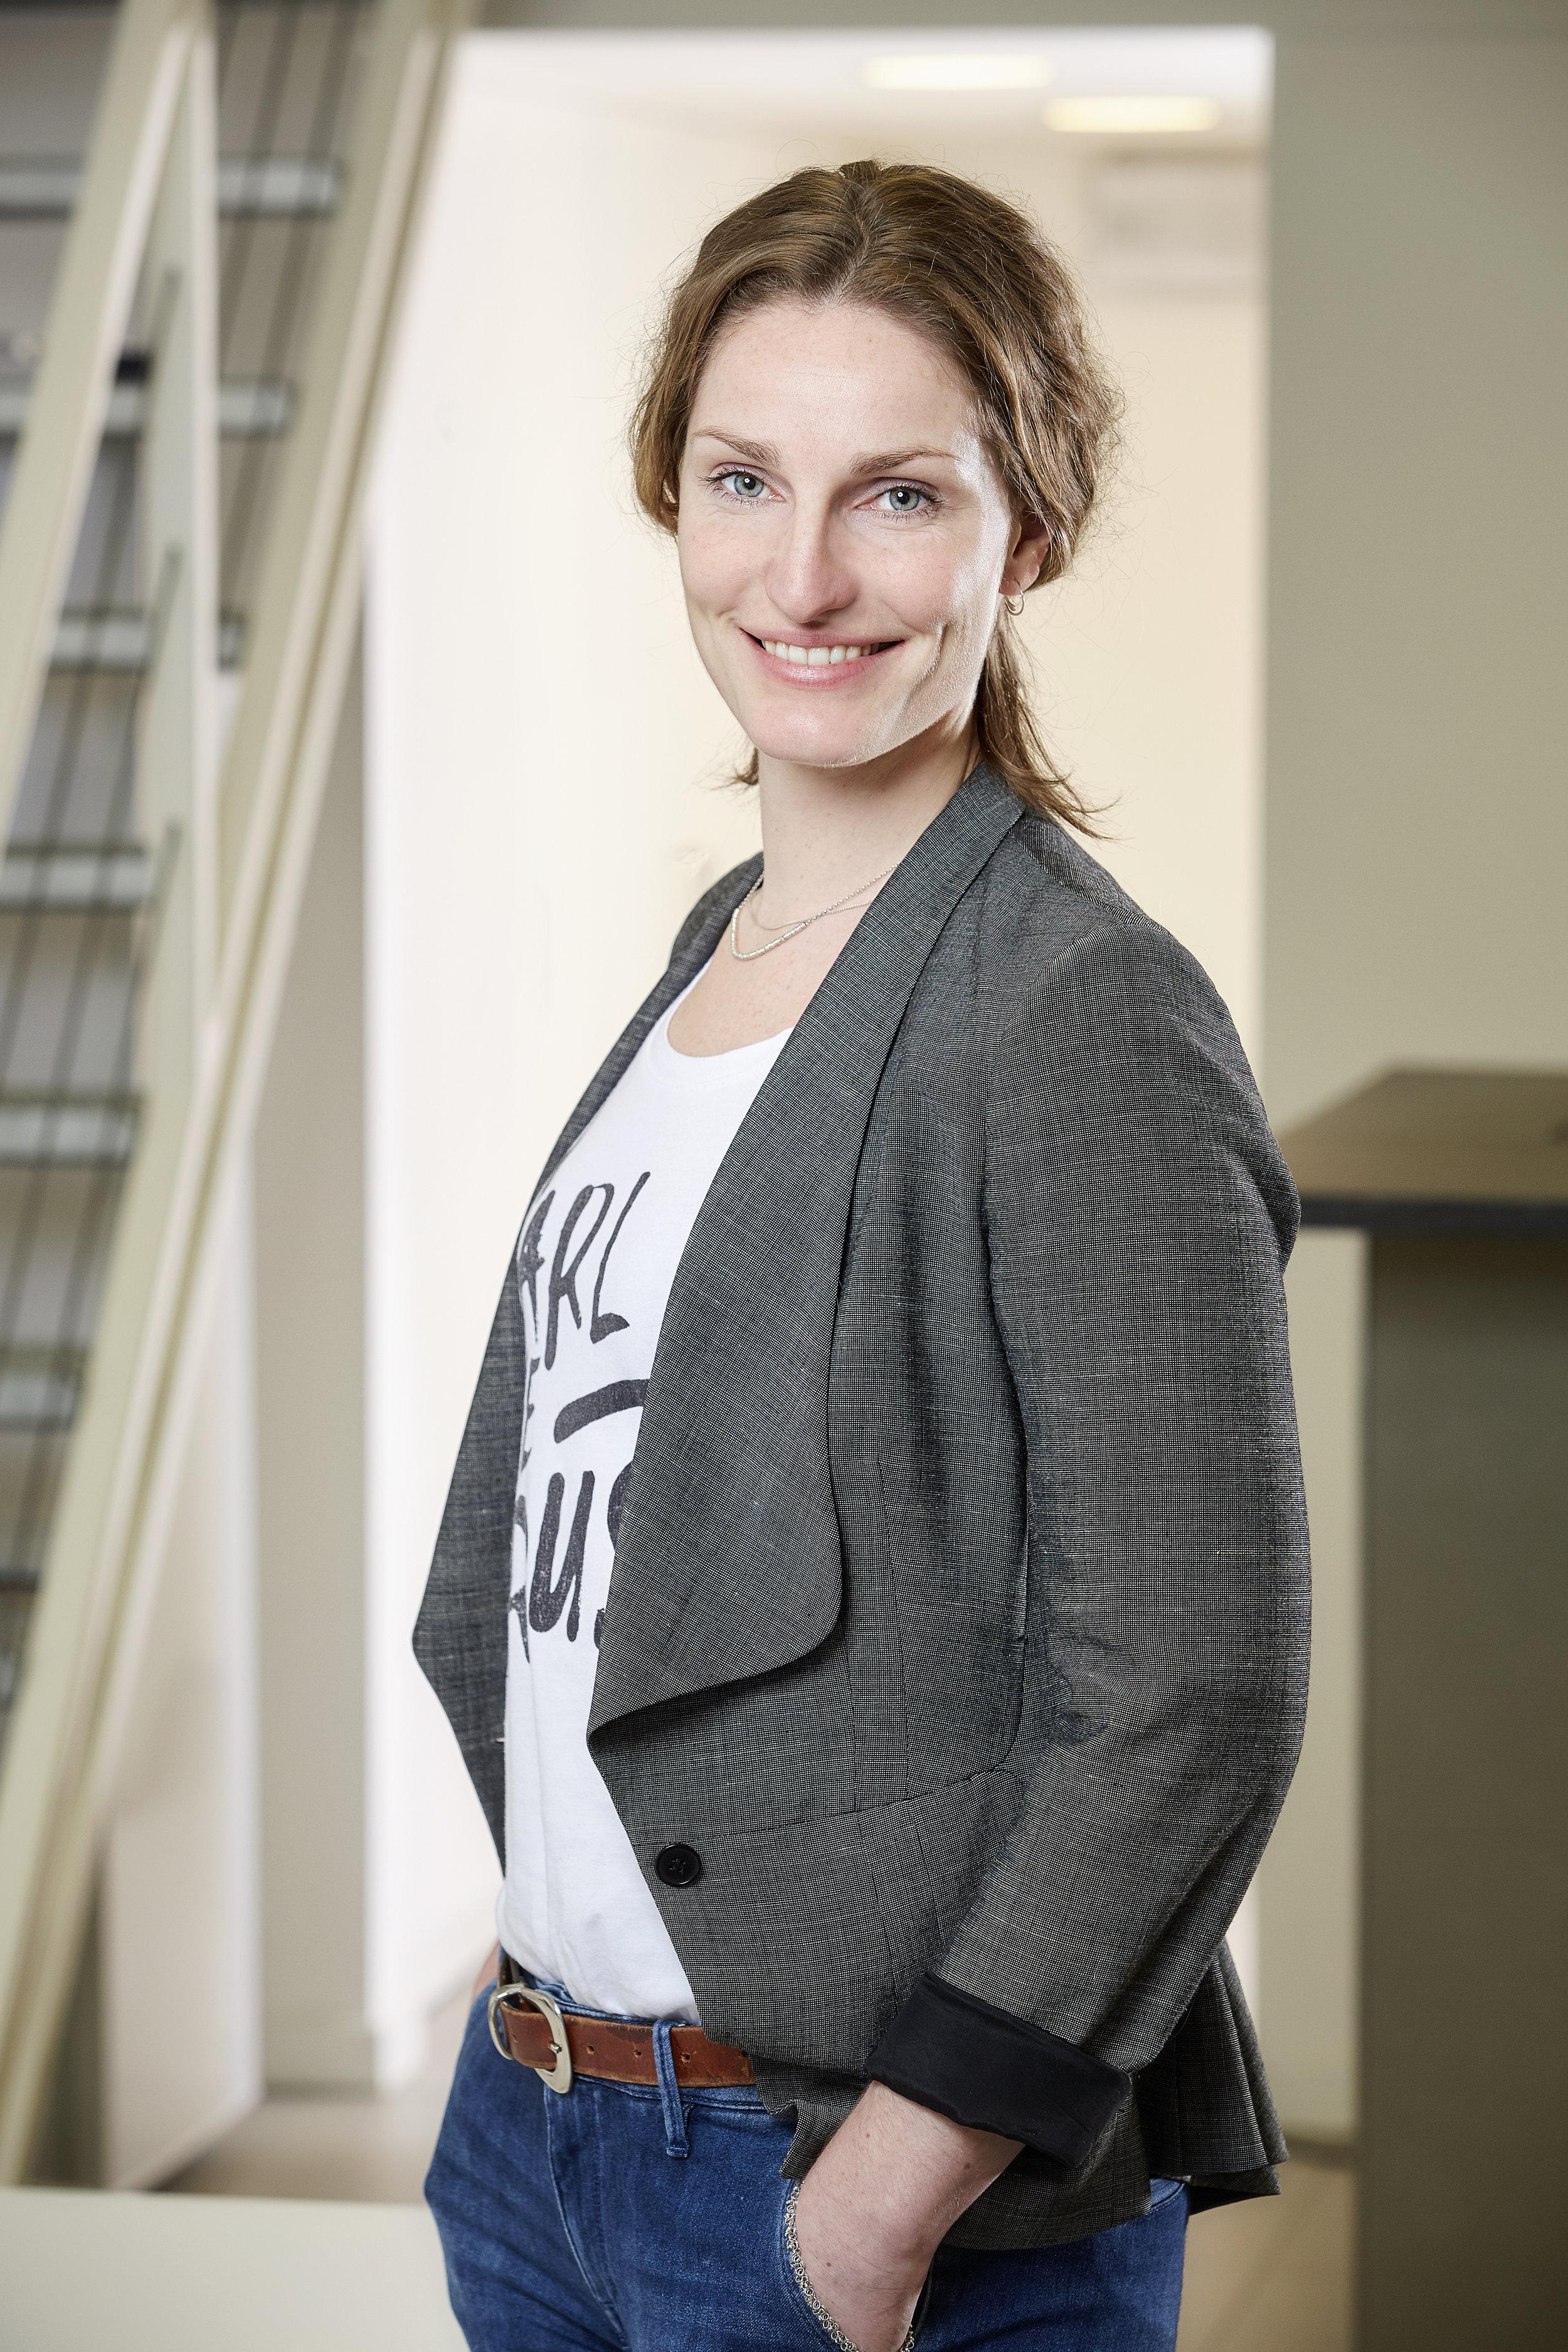 Sanne van Baar, HR and talent communications